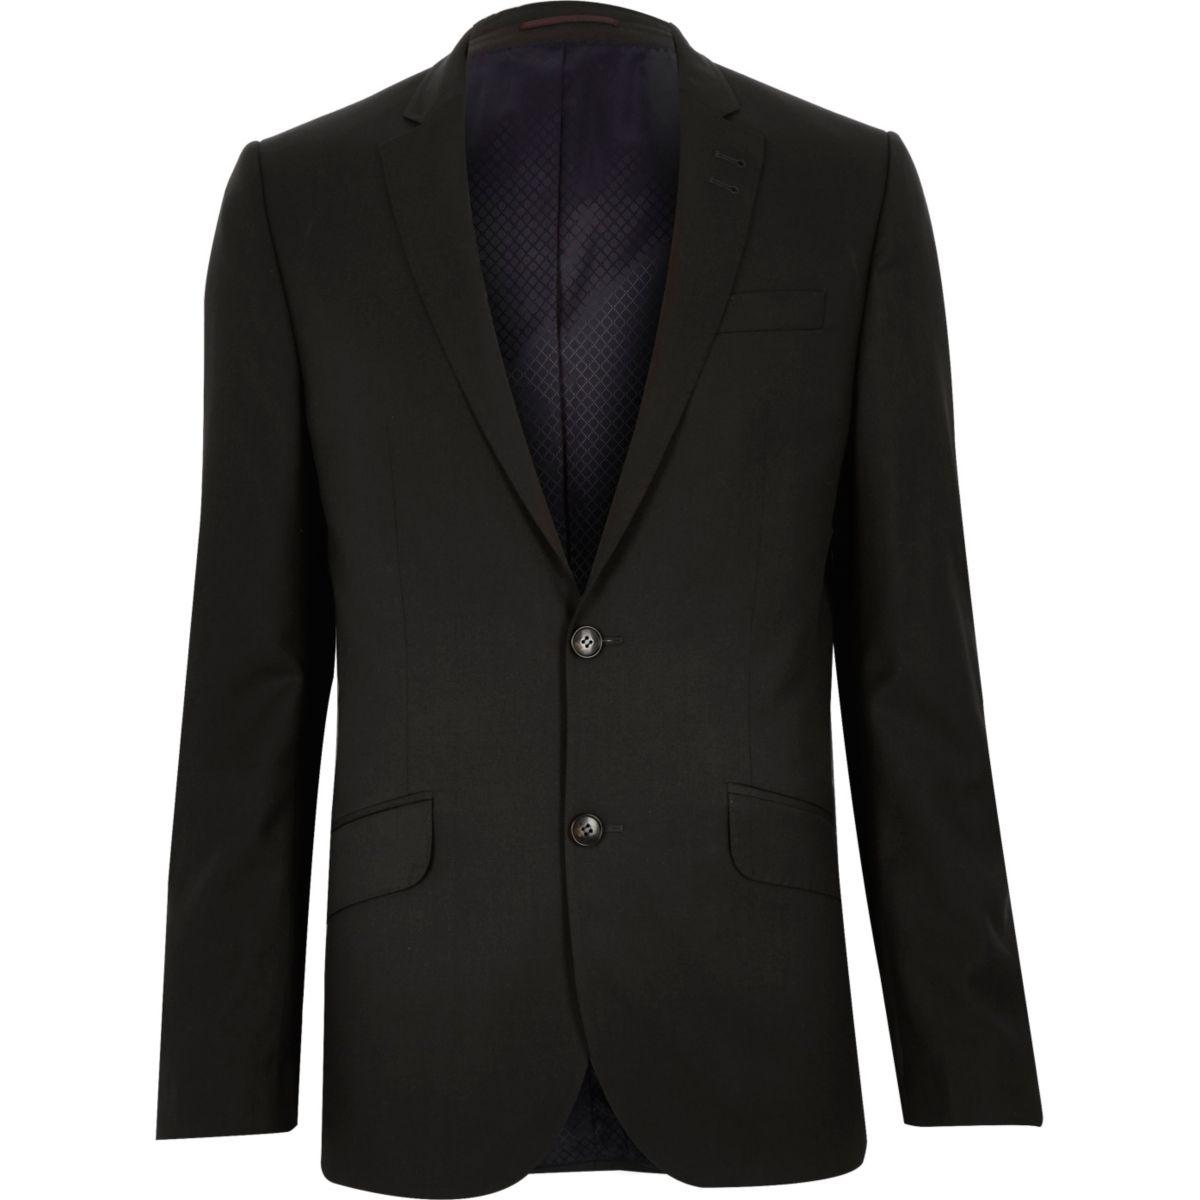 Darkest grey slim suit jacket